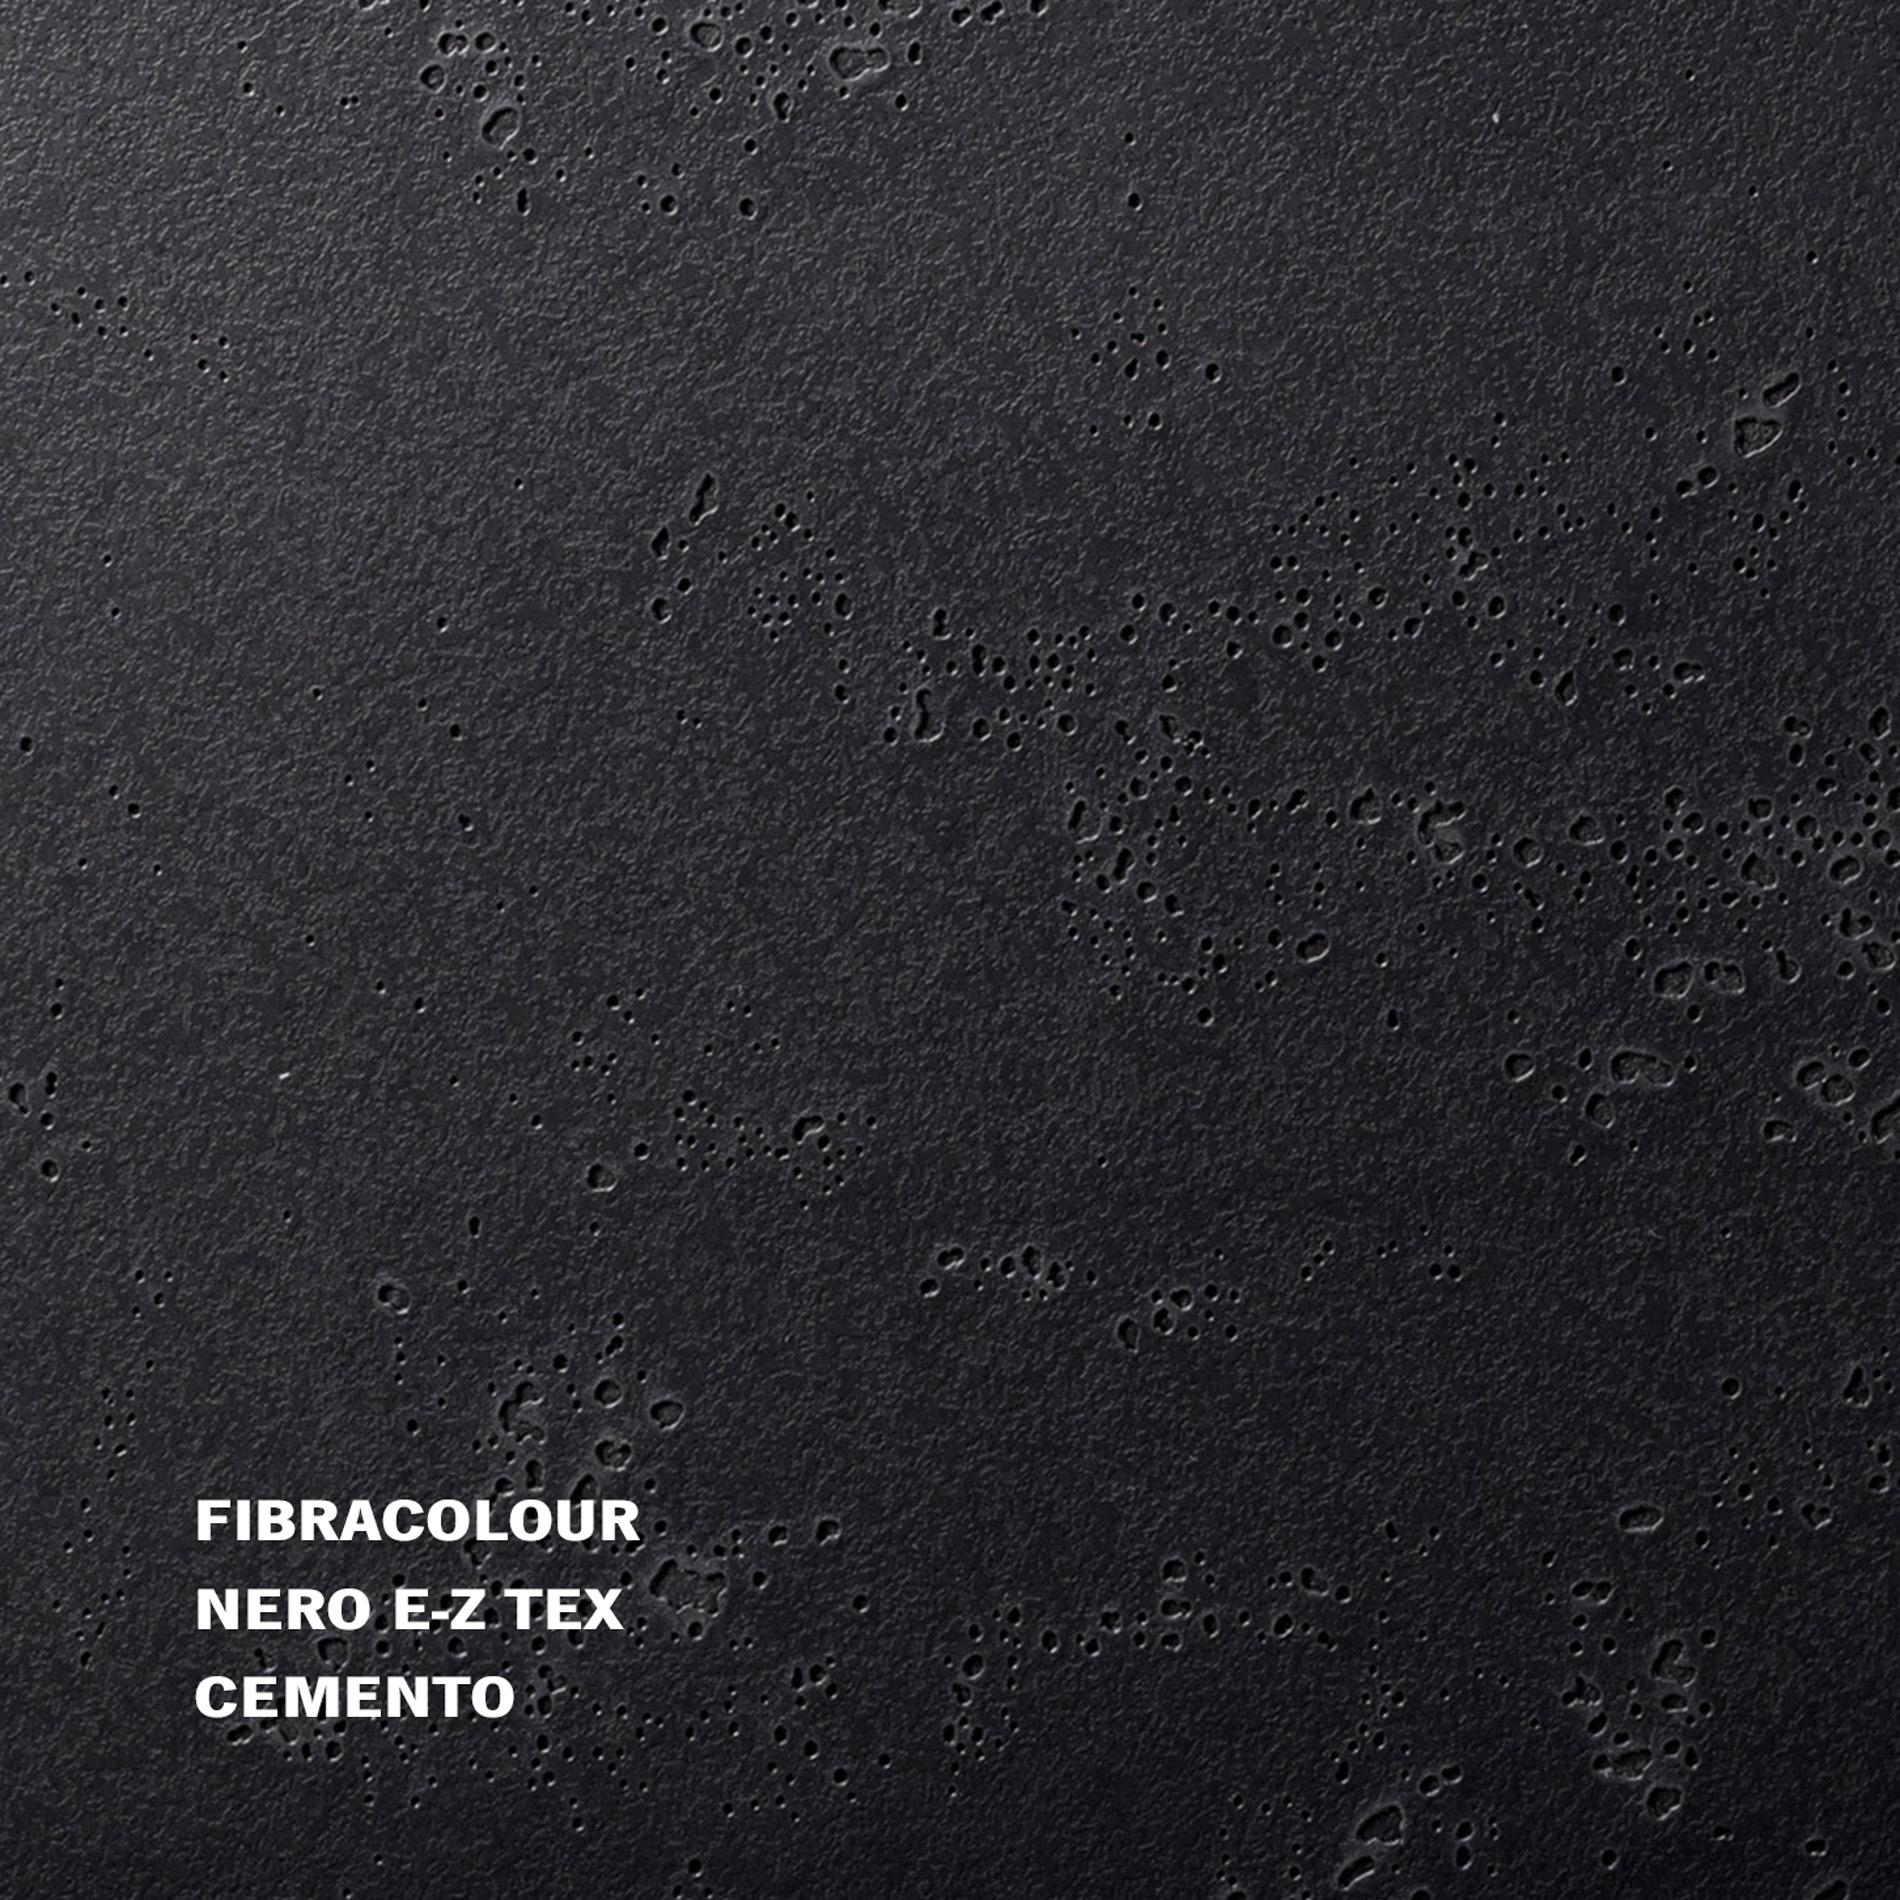 Fibracolor_CEMENTO_2